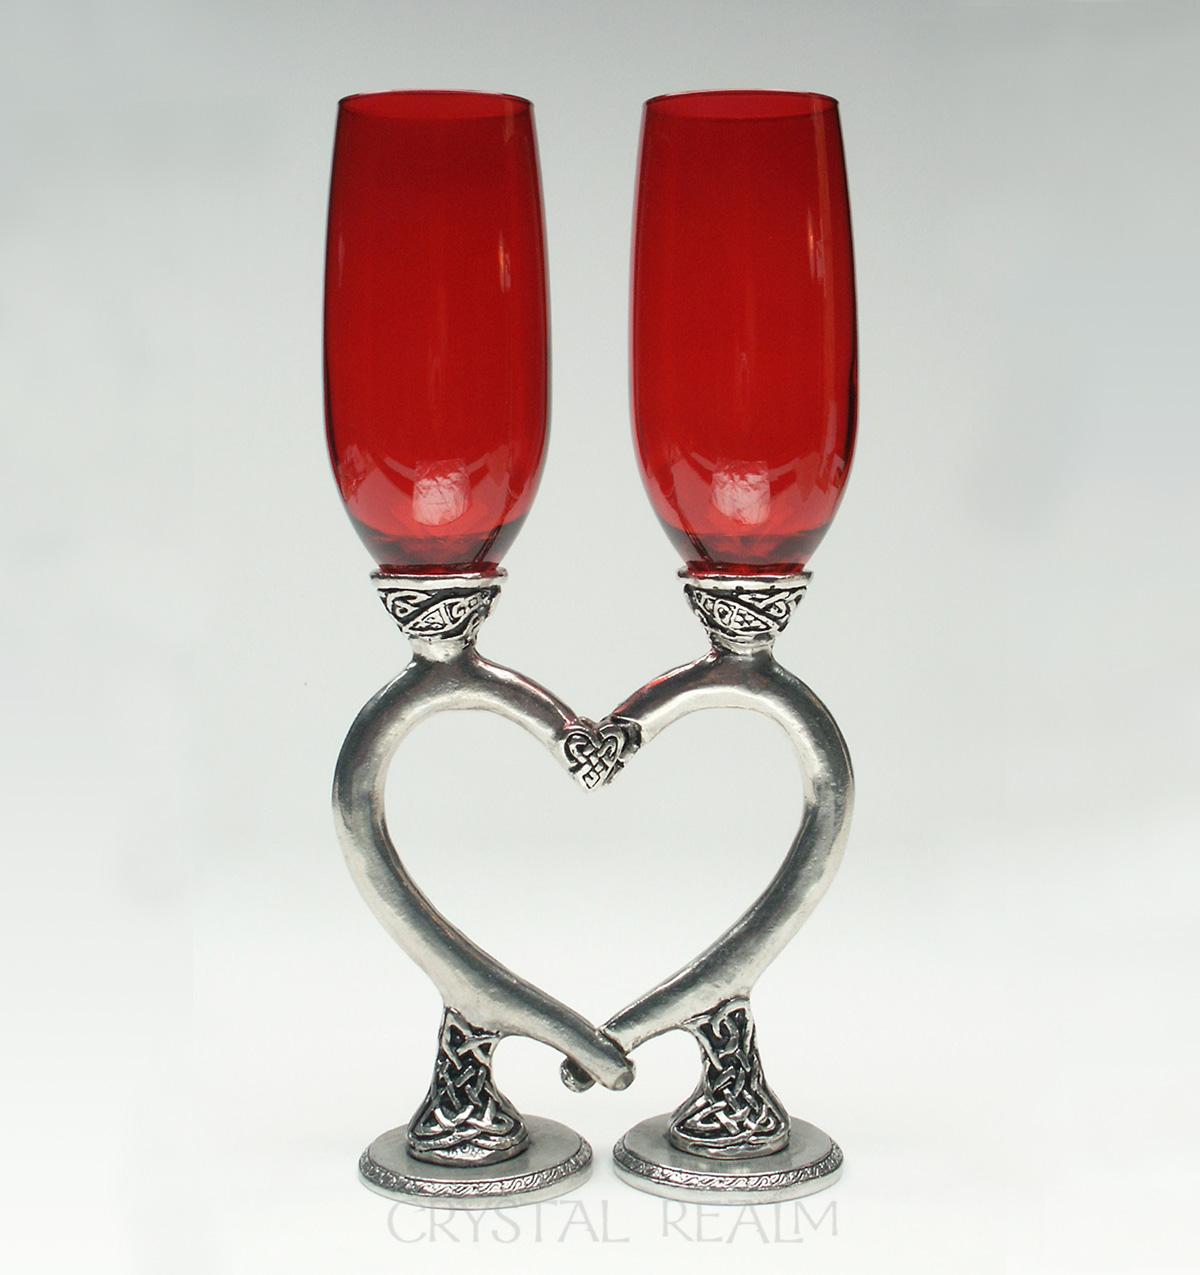 red celtic heart champagne glasses